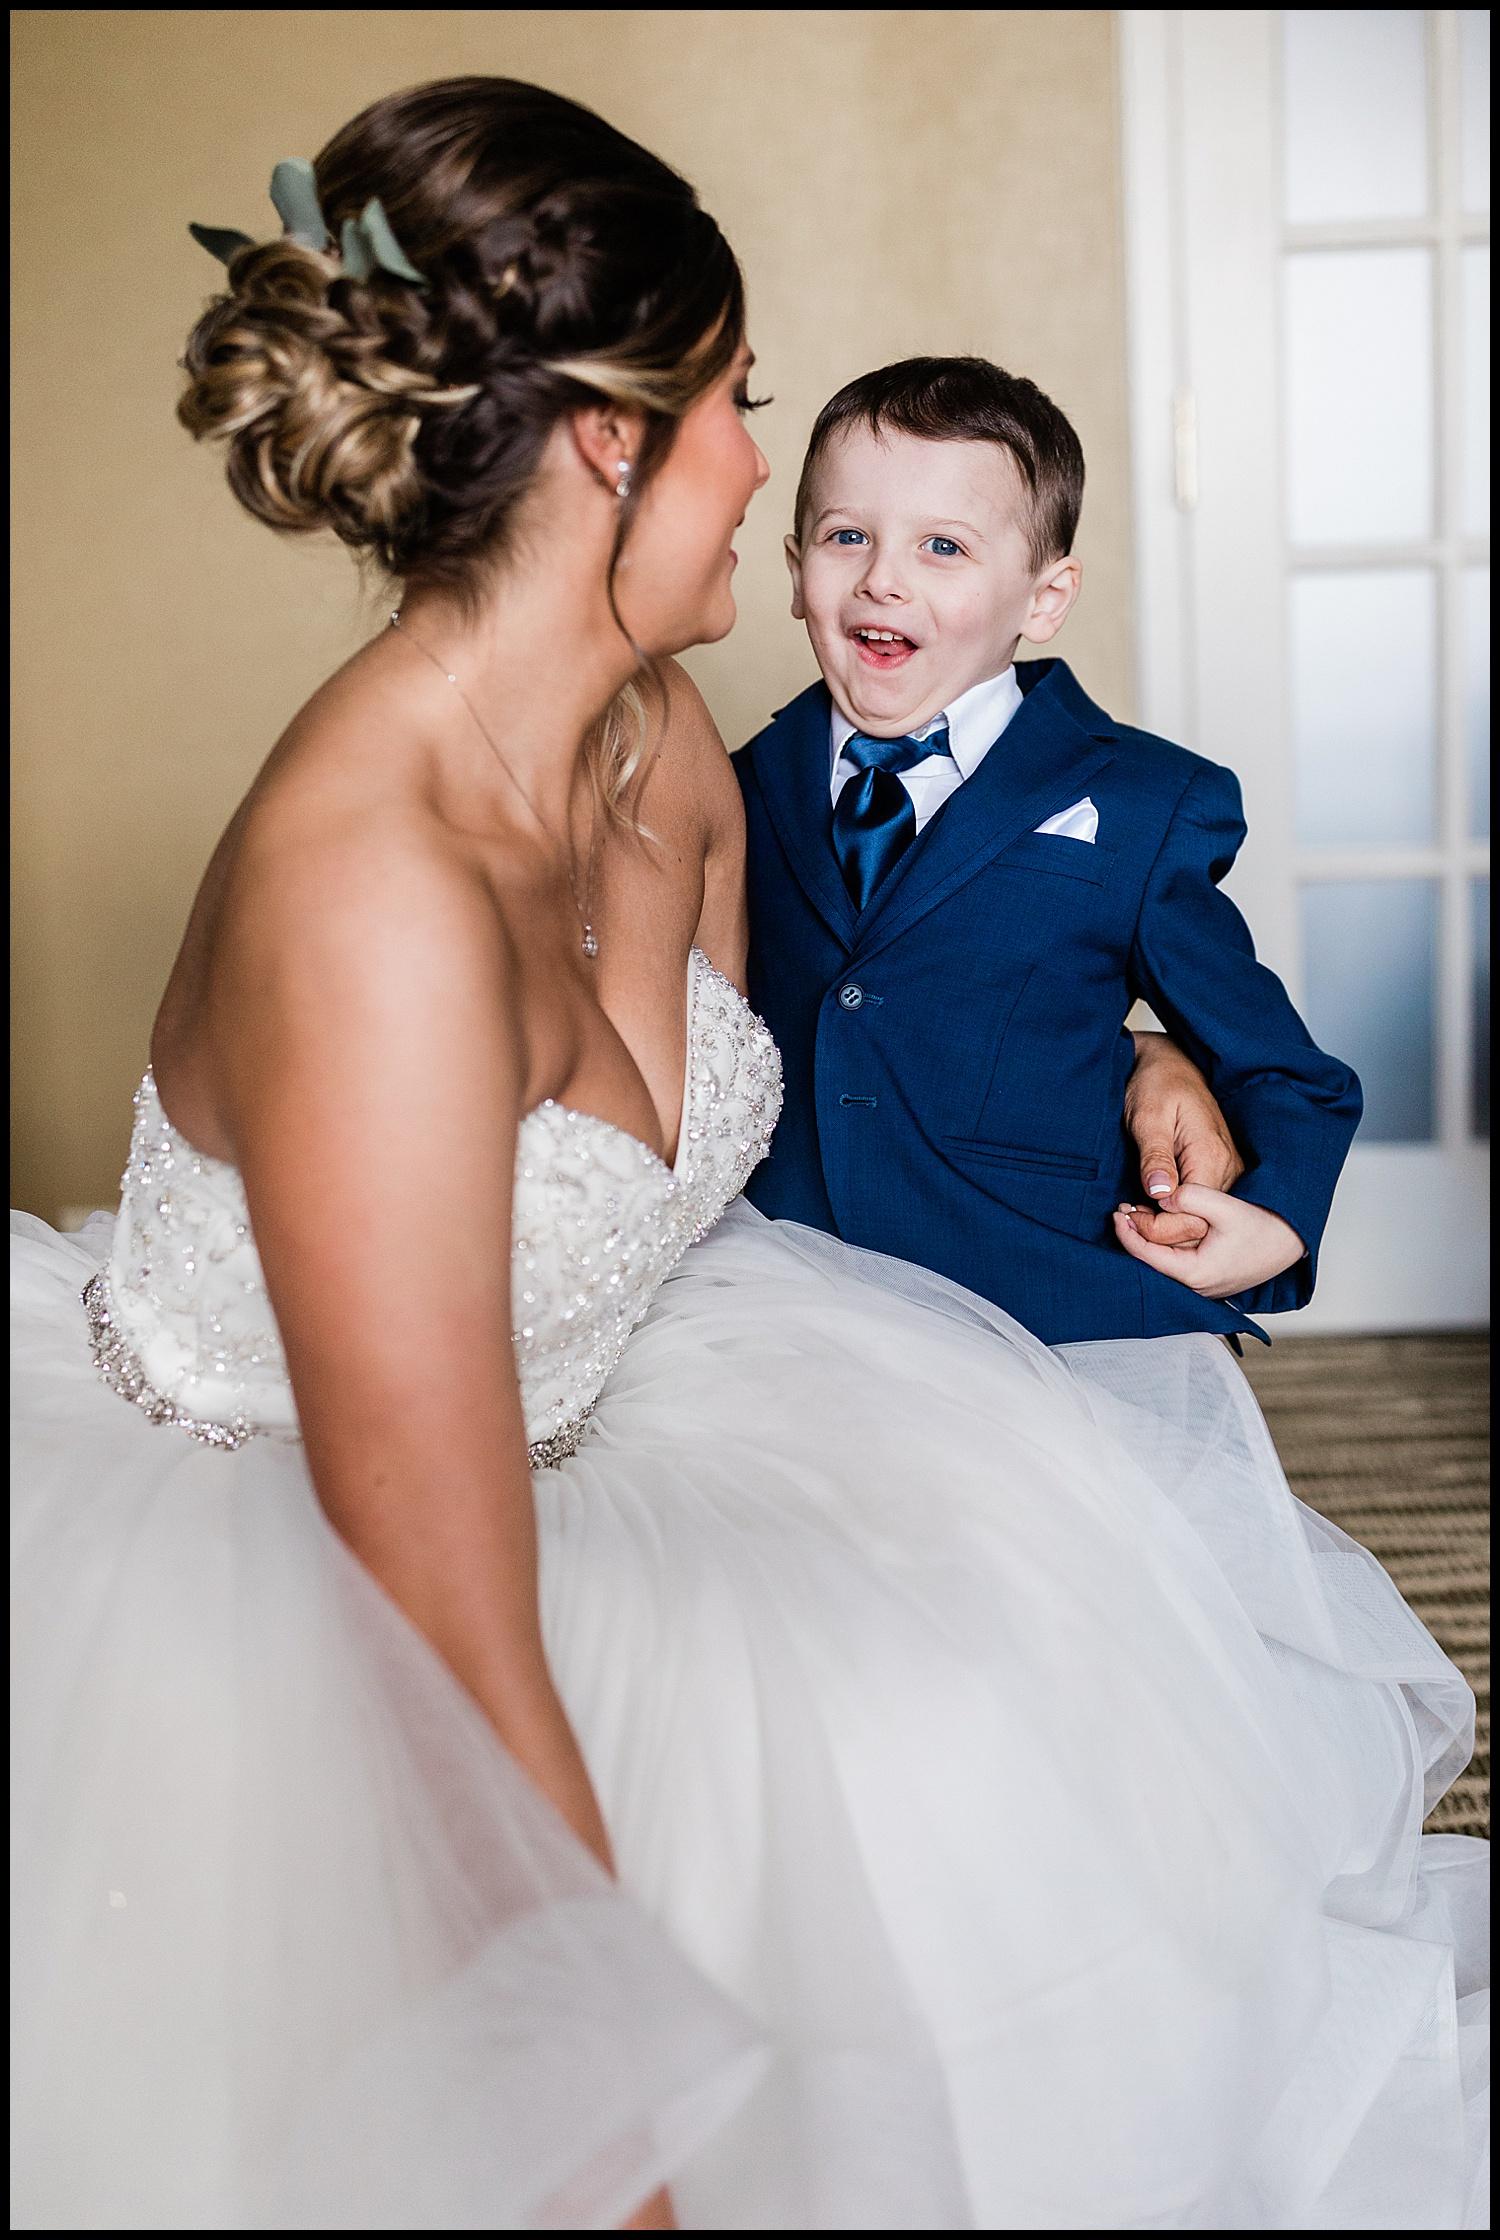 Natural-charlottesville-virginia-wedding-photographer_0011.jpg